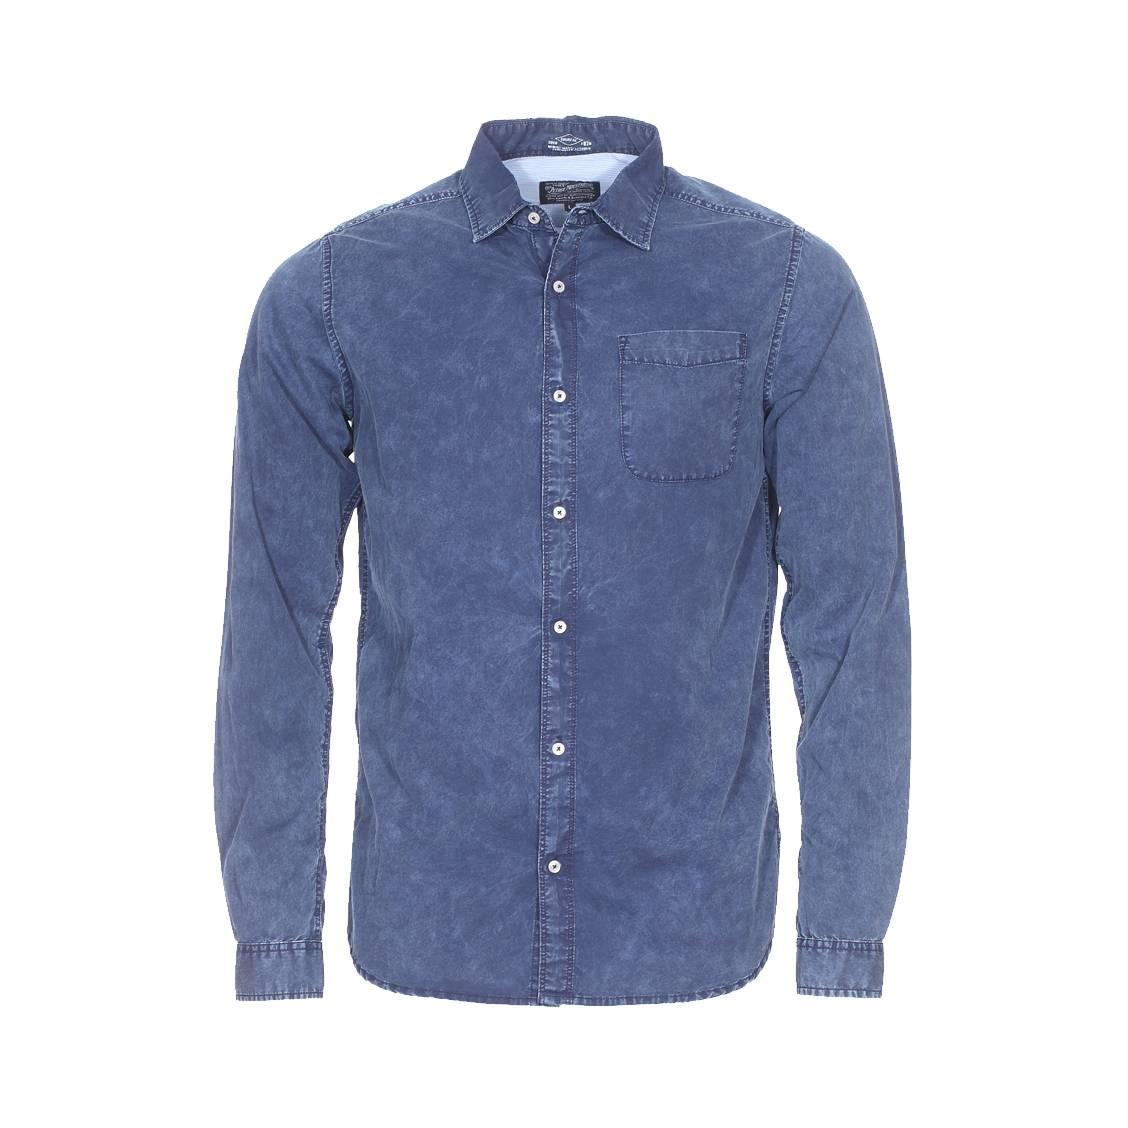 Look Petrol Vestes Industries Homme Fashion Bleu Indigo IvB1qw6x